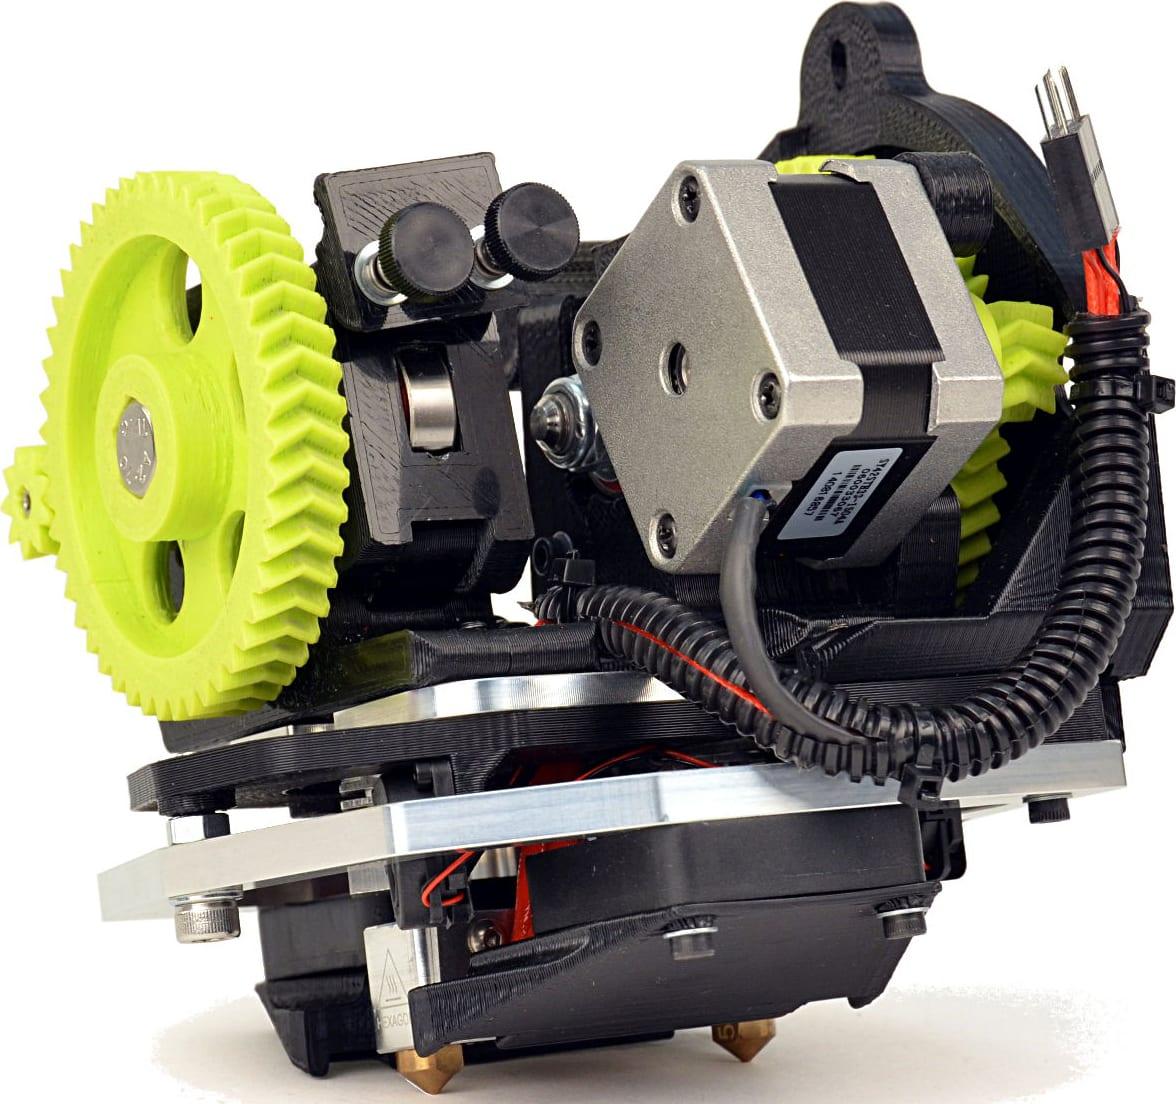 Lulzbot KT-CP0089 LulzBot TAZ Dual Extruder Tool Head v2